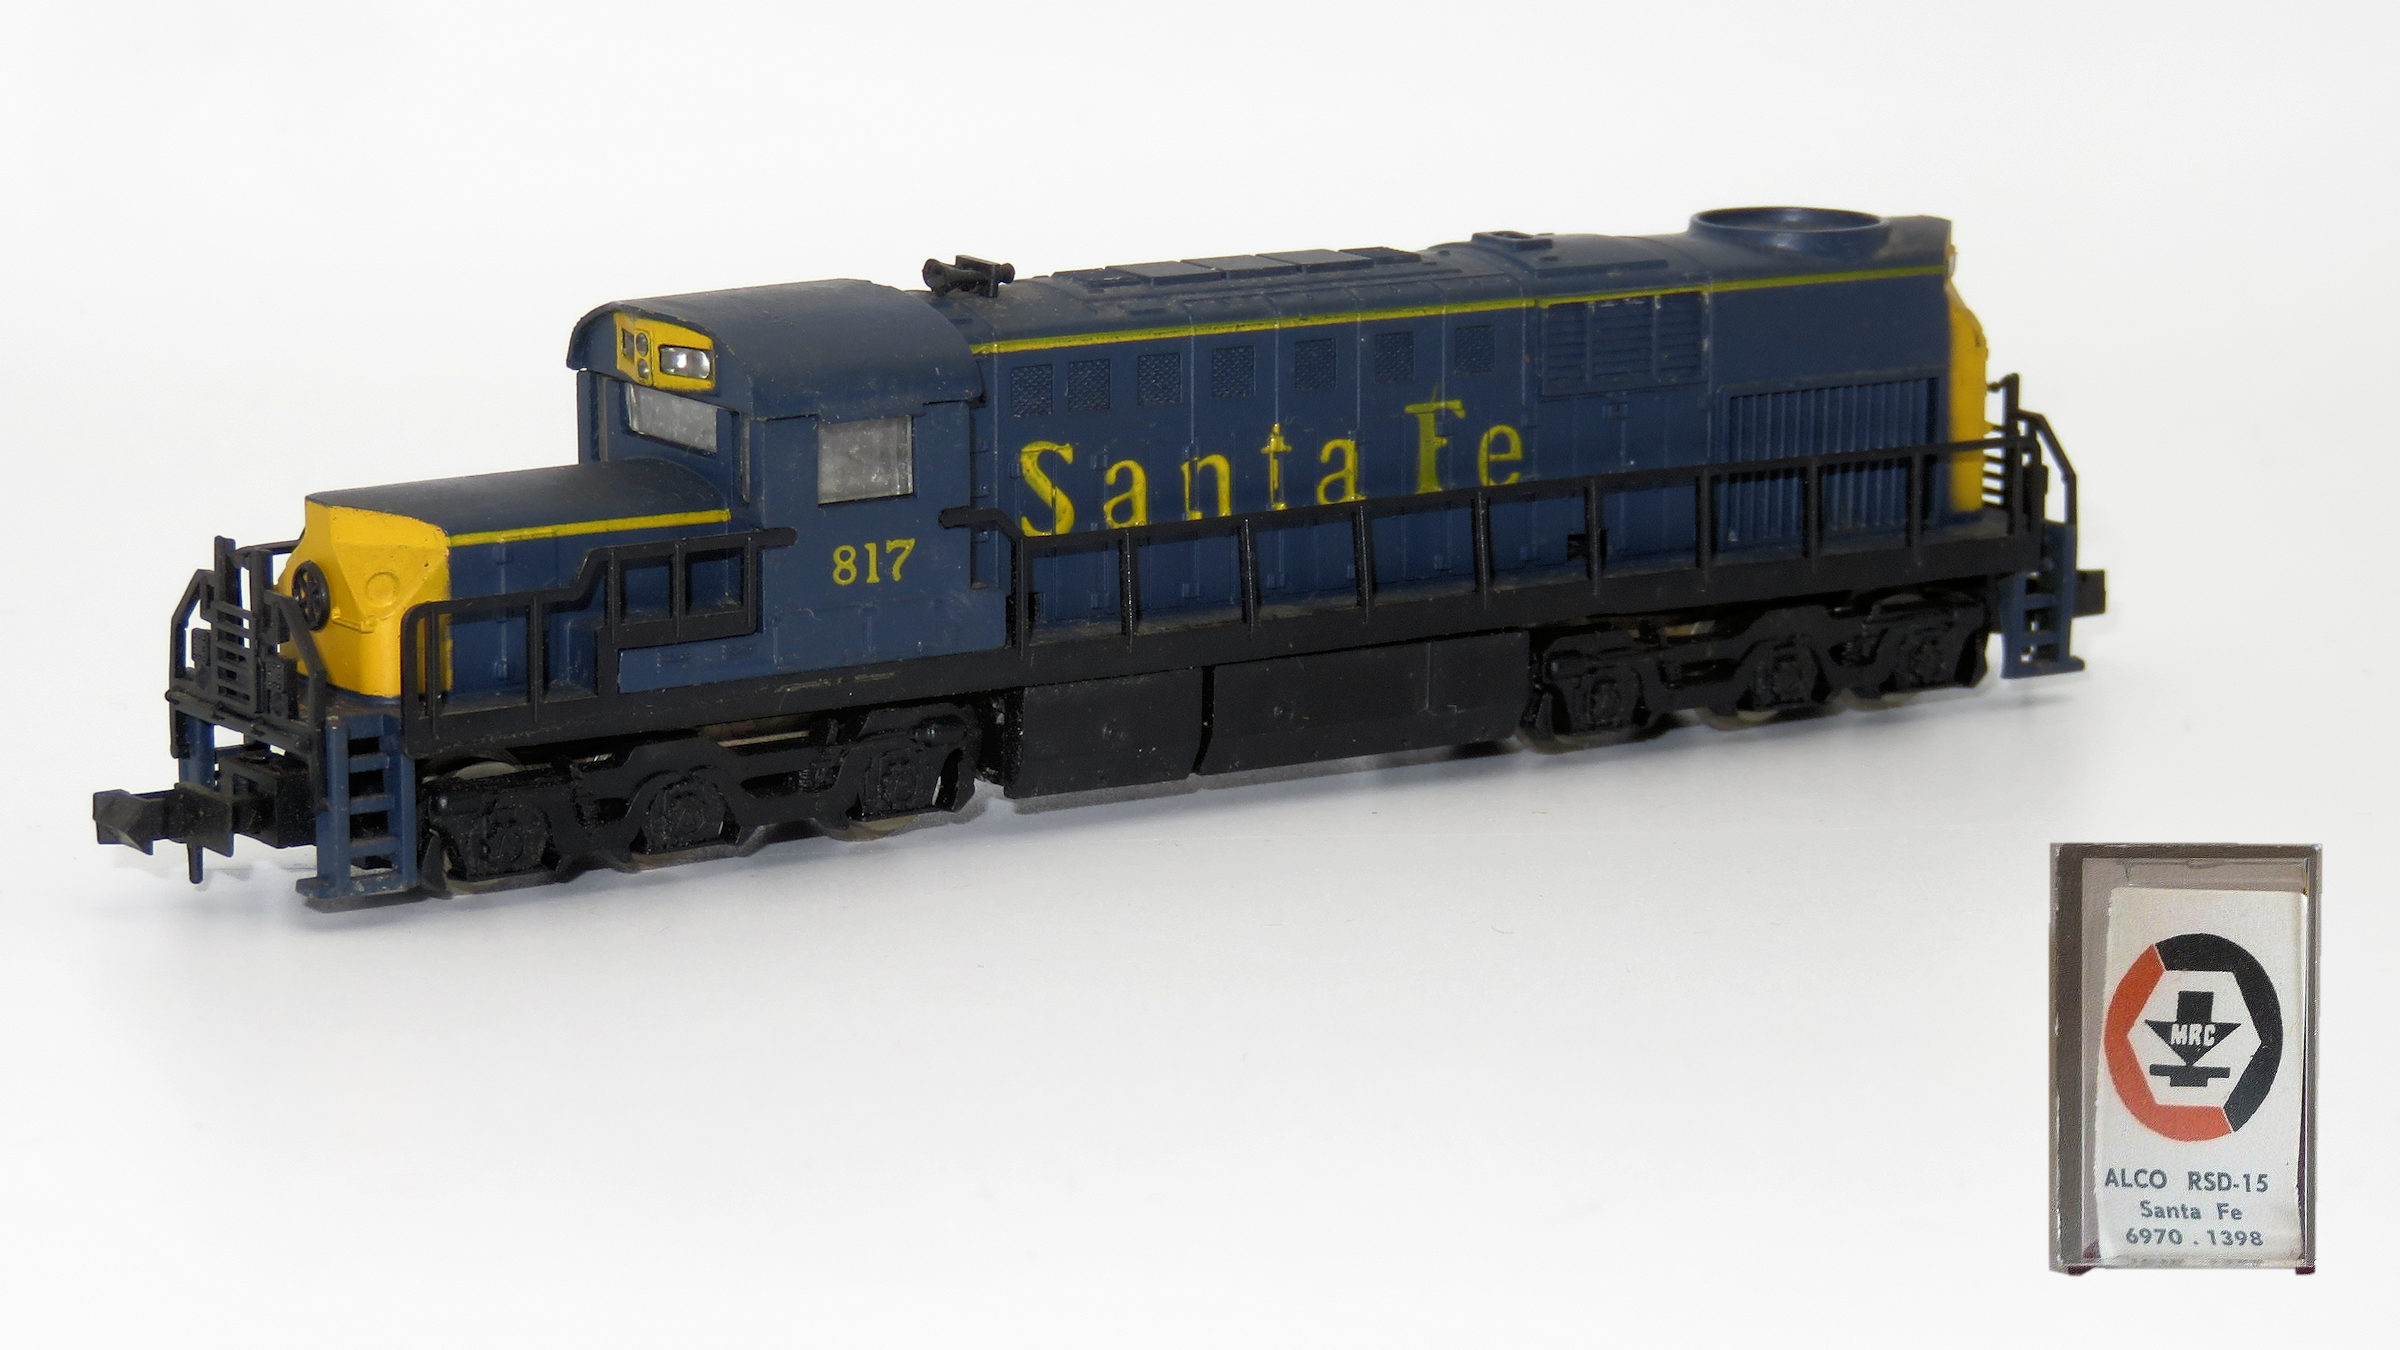 N Scale - MRC - 6970 - Locomotive, Diesel, Alco RSD-15 - Santa Fe - 817